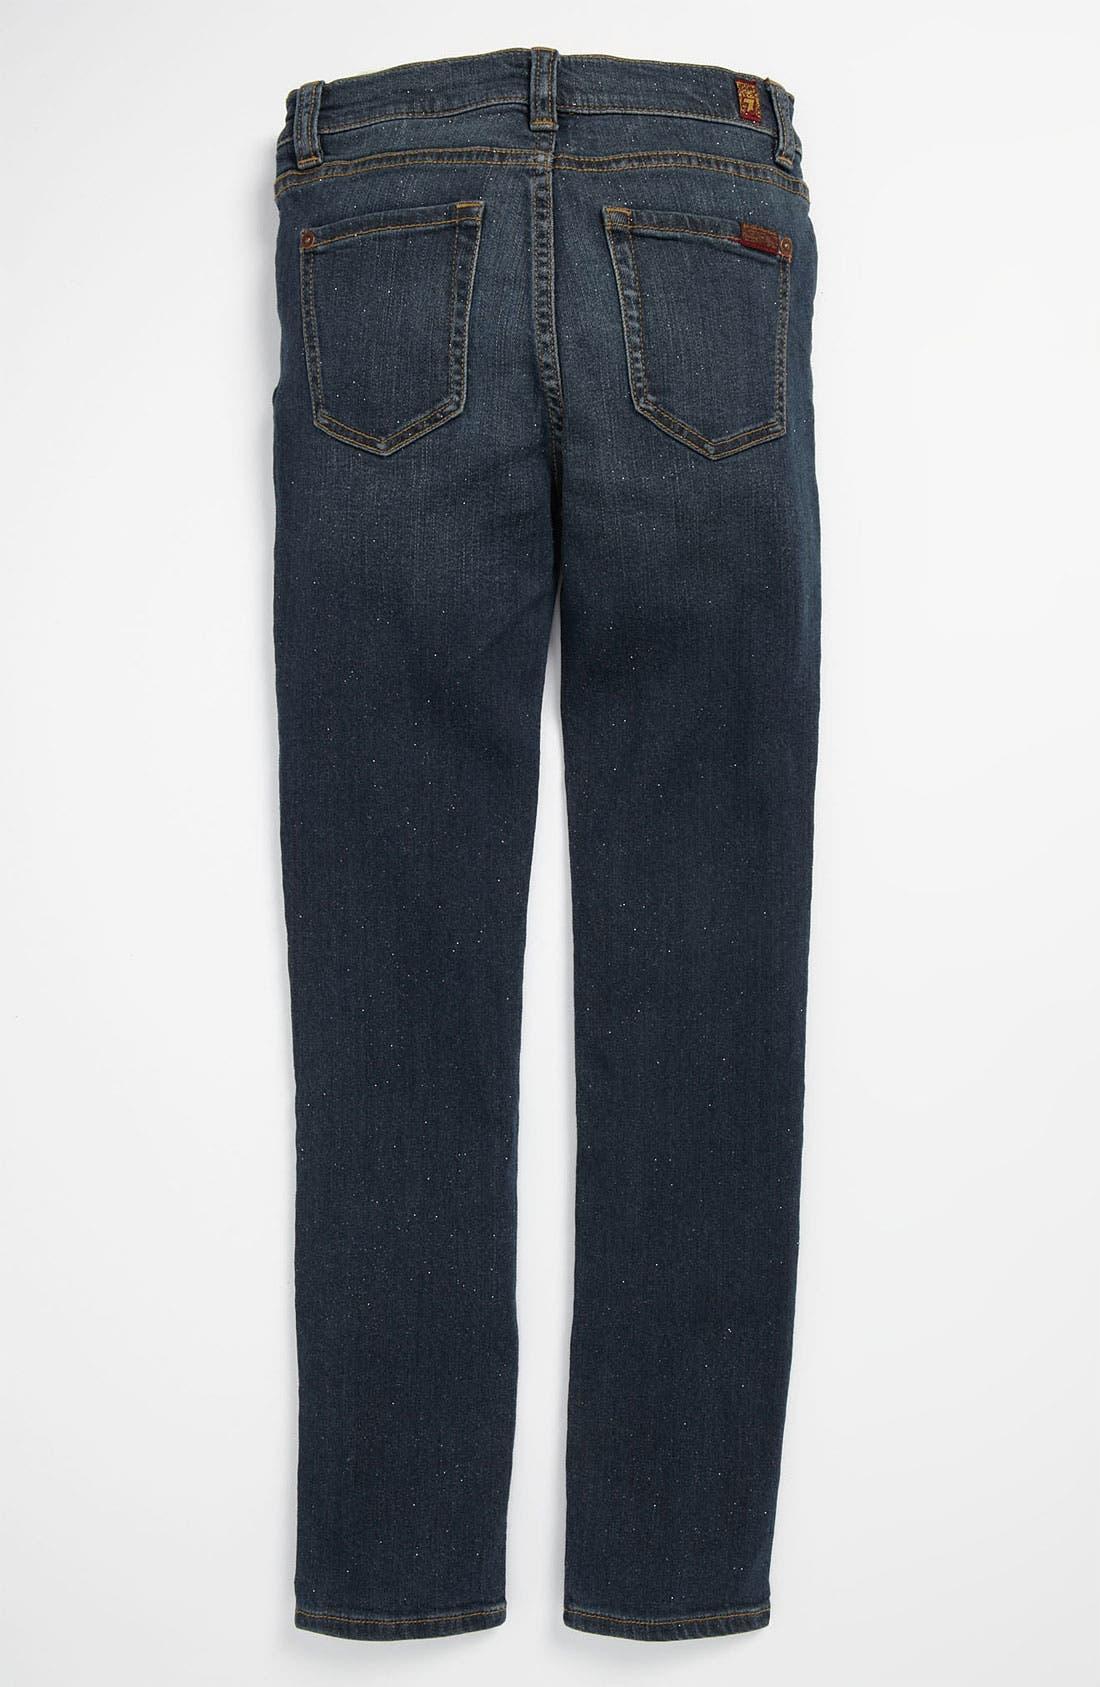 Alternate Image 1 Selected - 7 For All Mankind® Sparkle Stretch Skinny Leg Jeans (Big Girls)